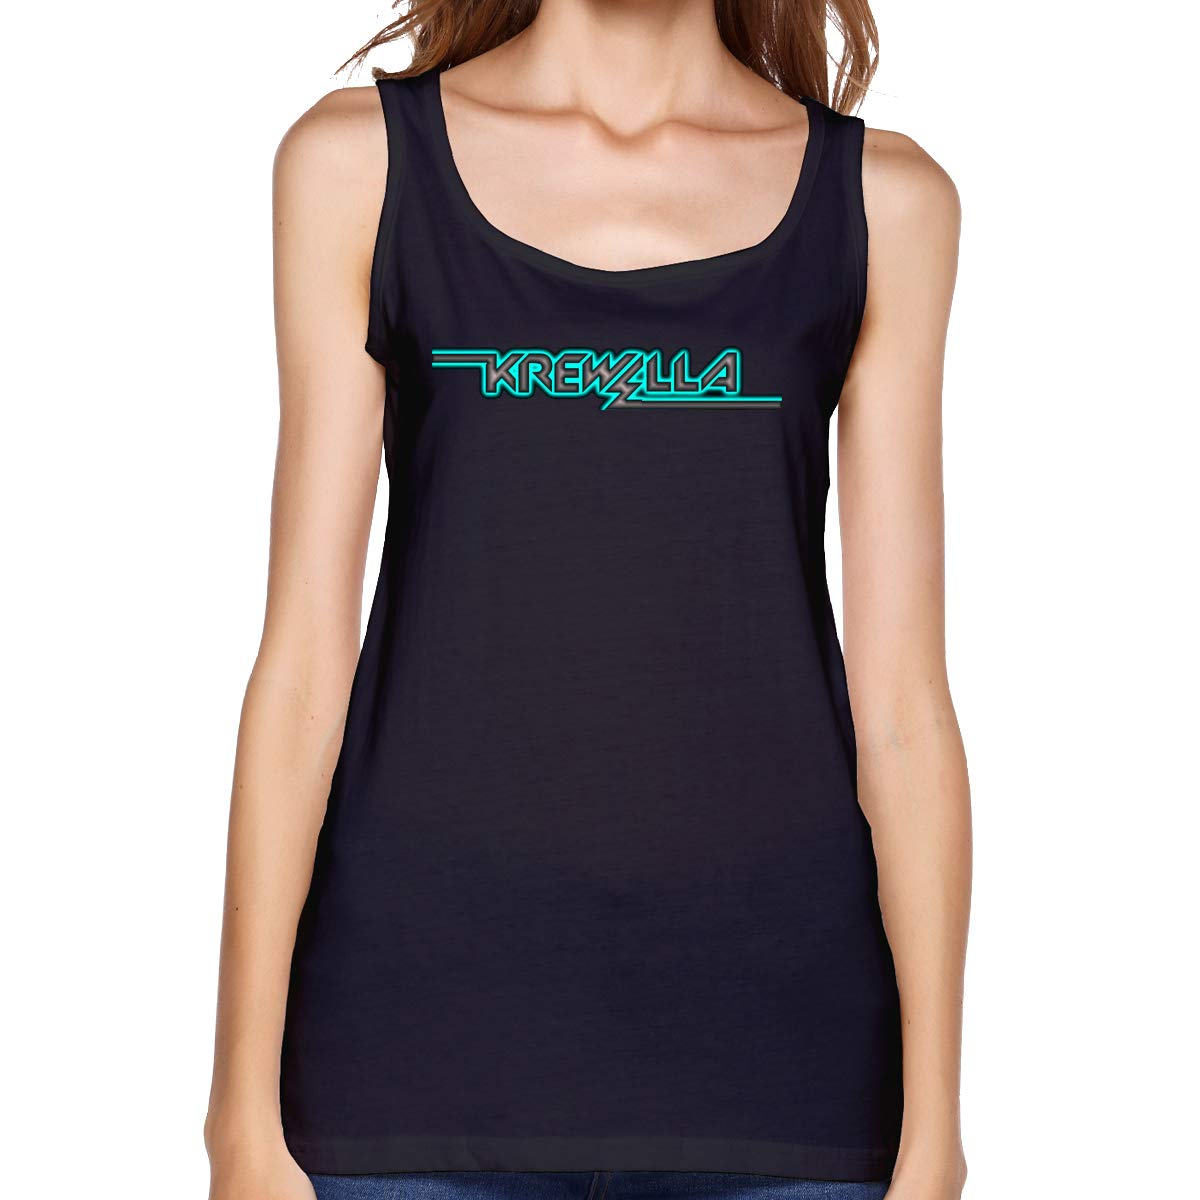 Fredrmarr Krewella Summer Sleeveless Casual Tank Tops T-shirts